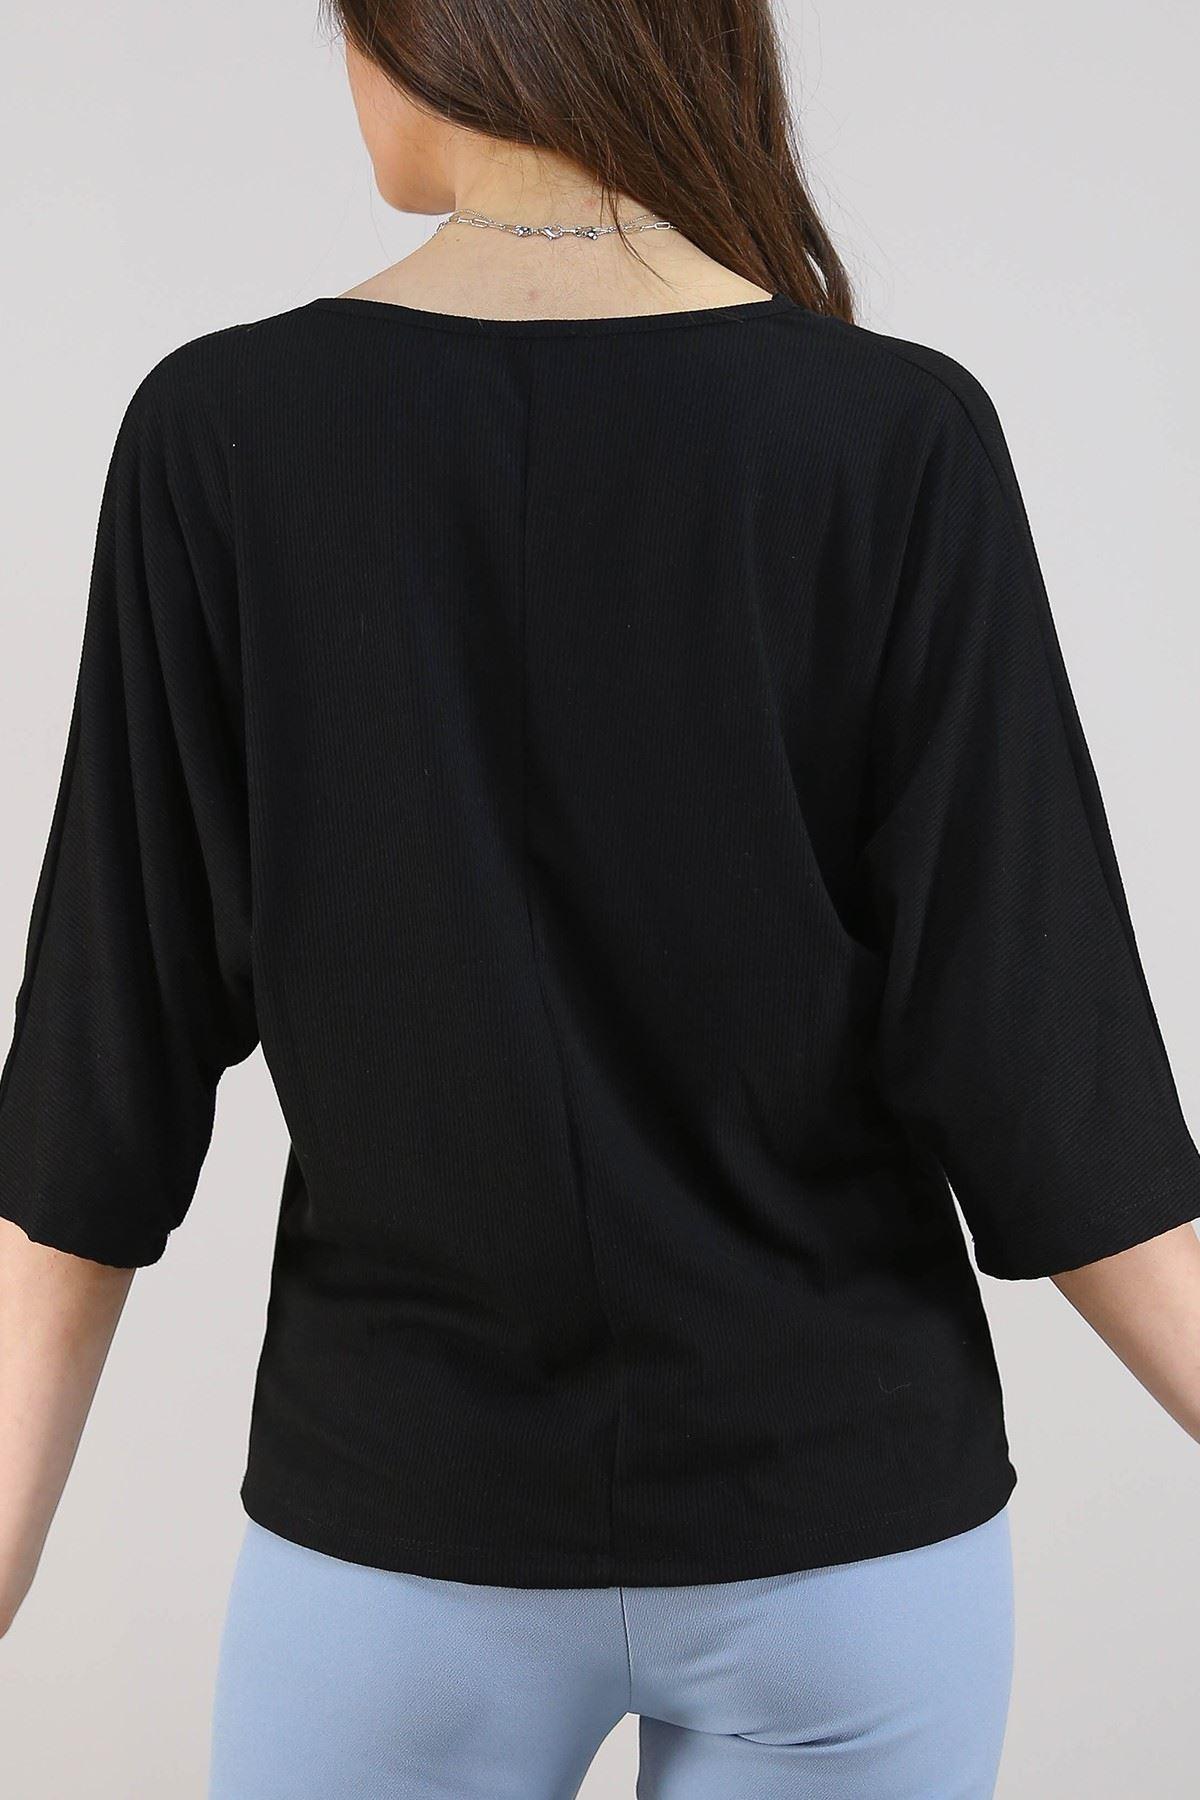 Yaka Dantelli Bluz Siyah - 3331.222.